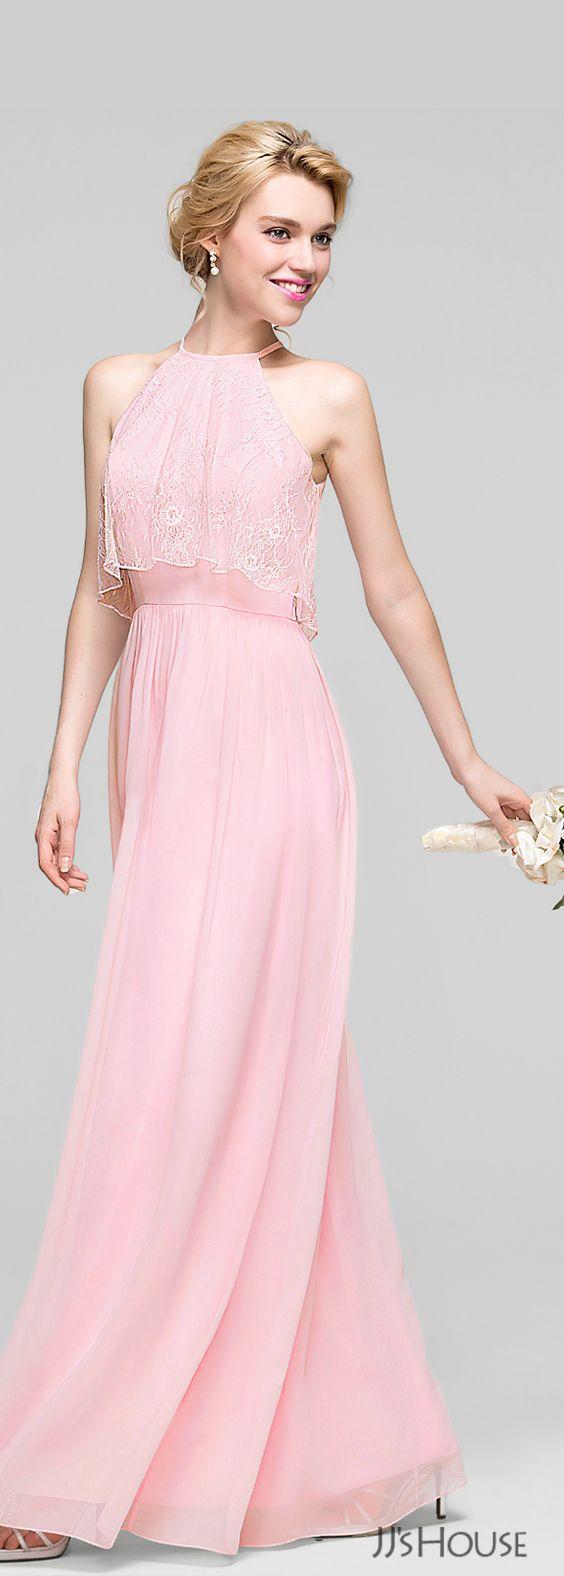 302 best Faldas y vestidos images on Pinterest | Flower girls ...